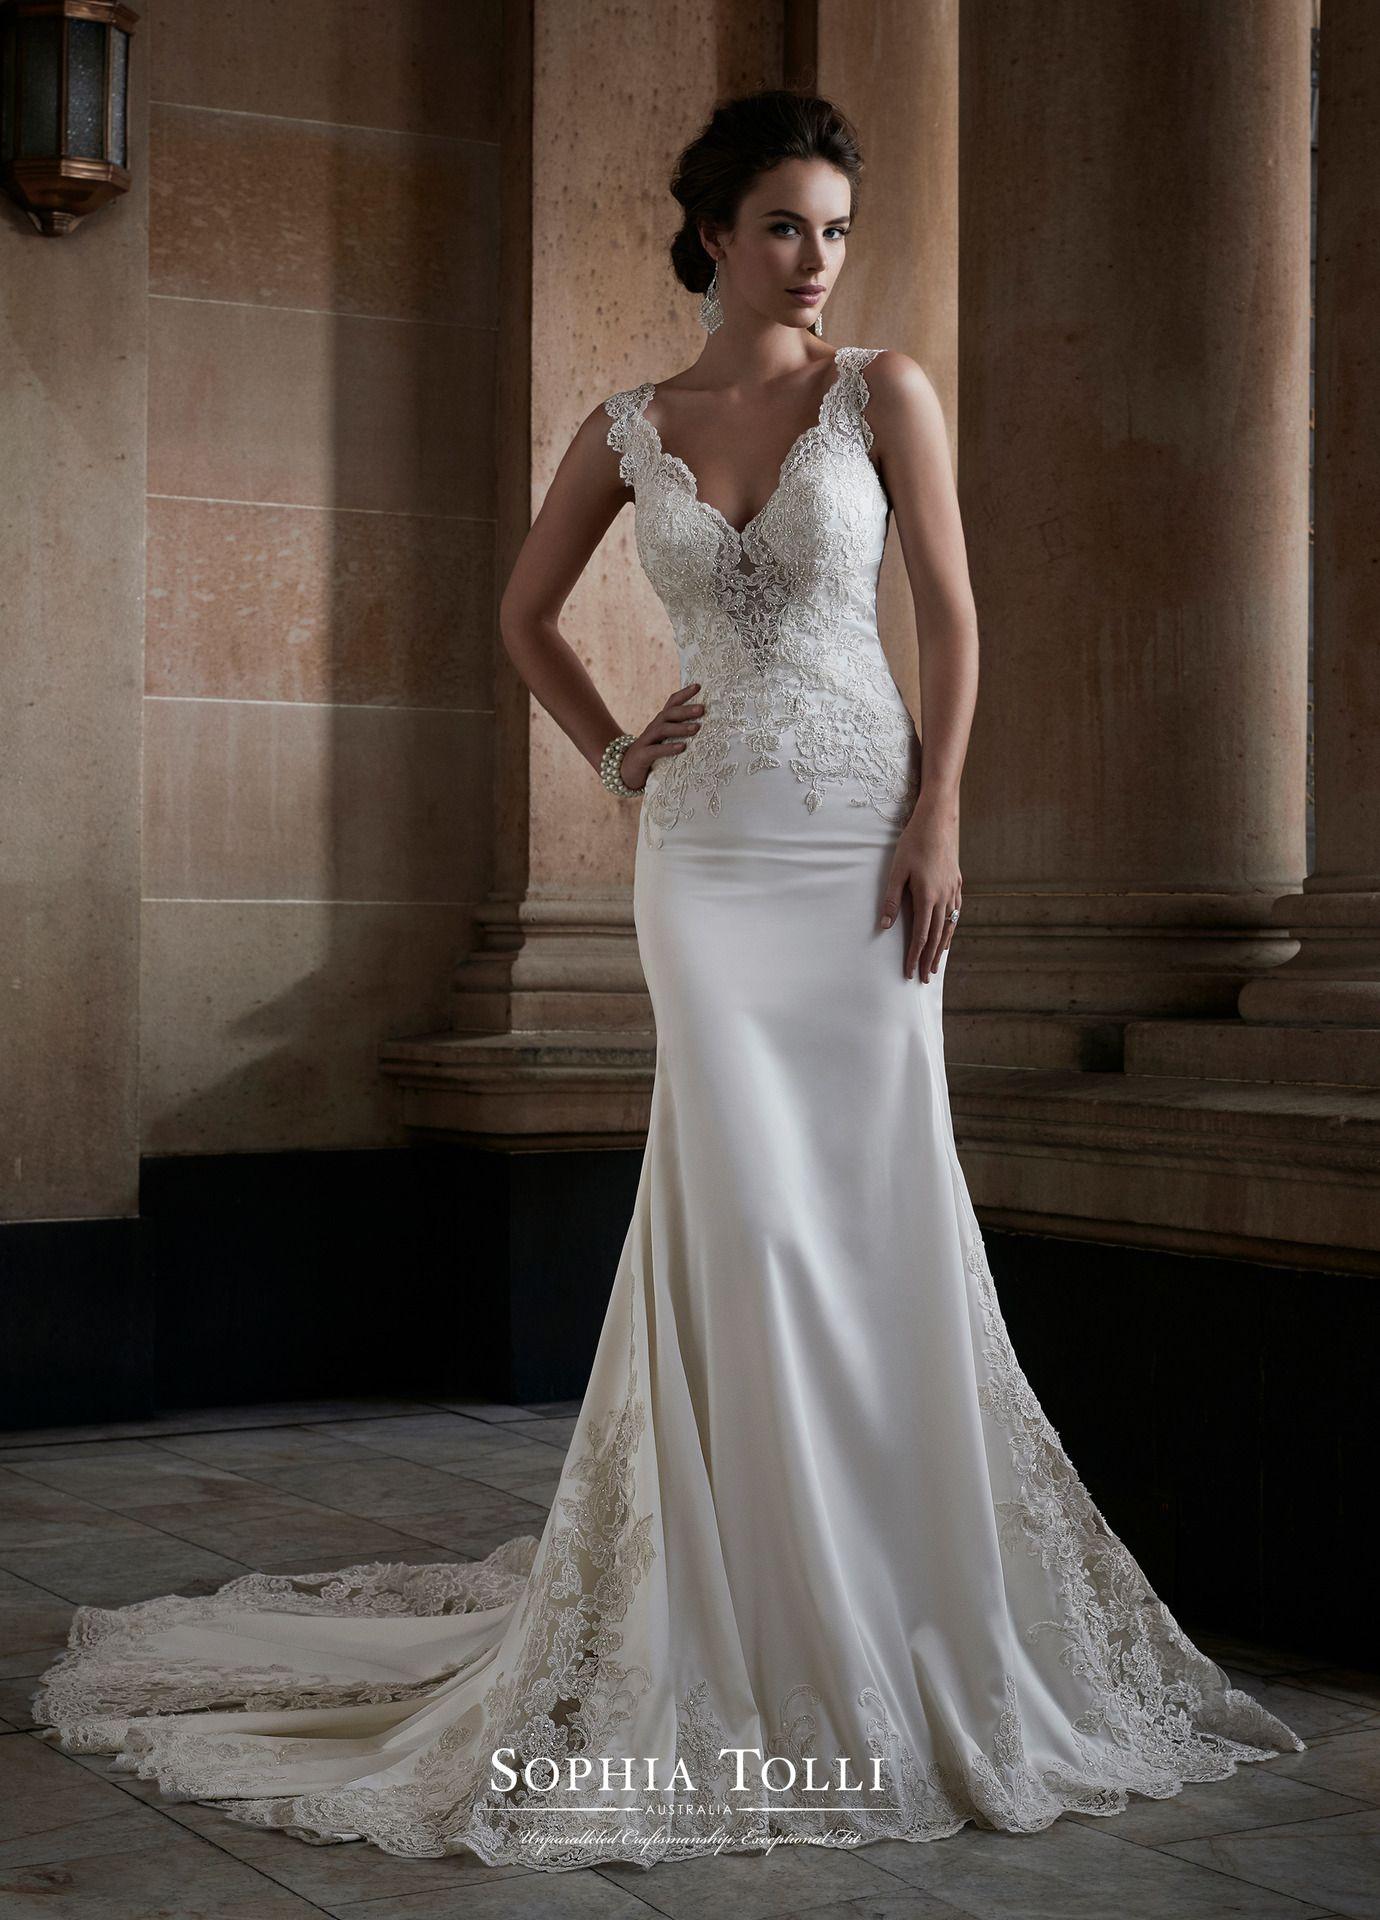 Sophia Tolli #Y21749 Adhara   Sophia Tolli Wedding Dresses ...